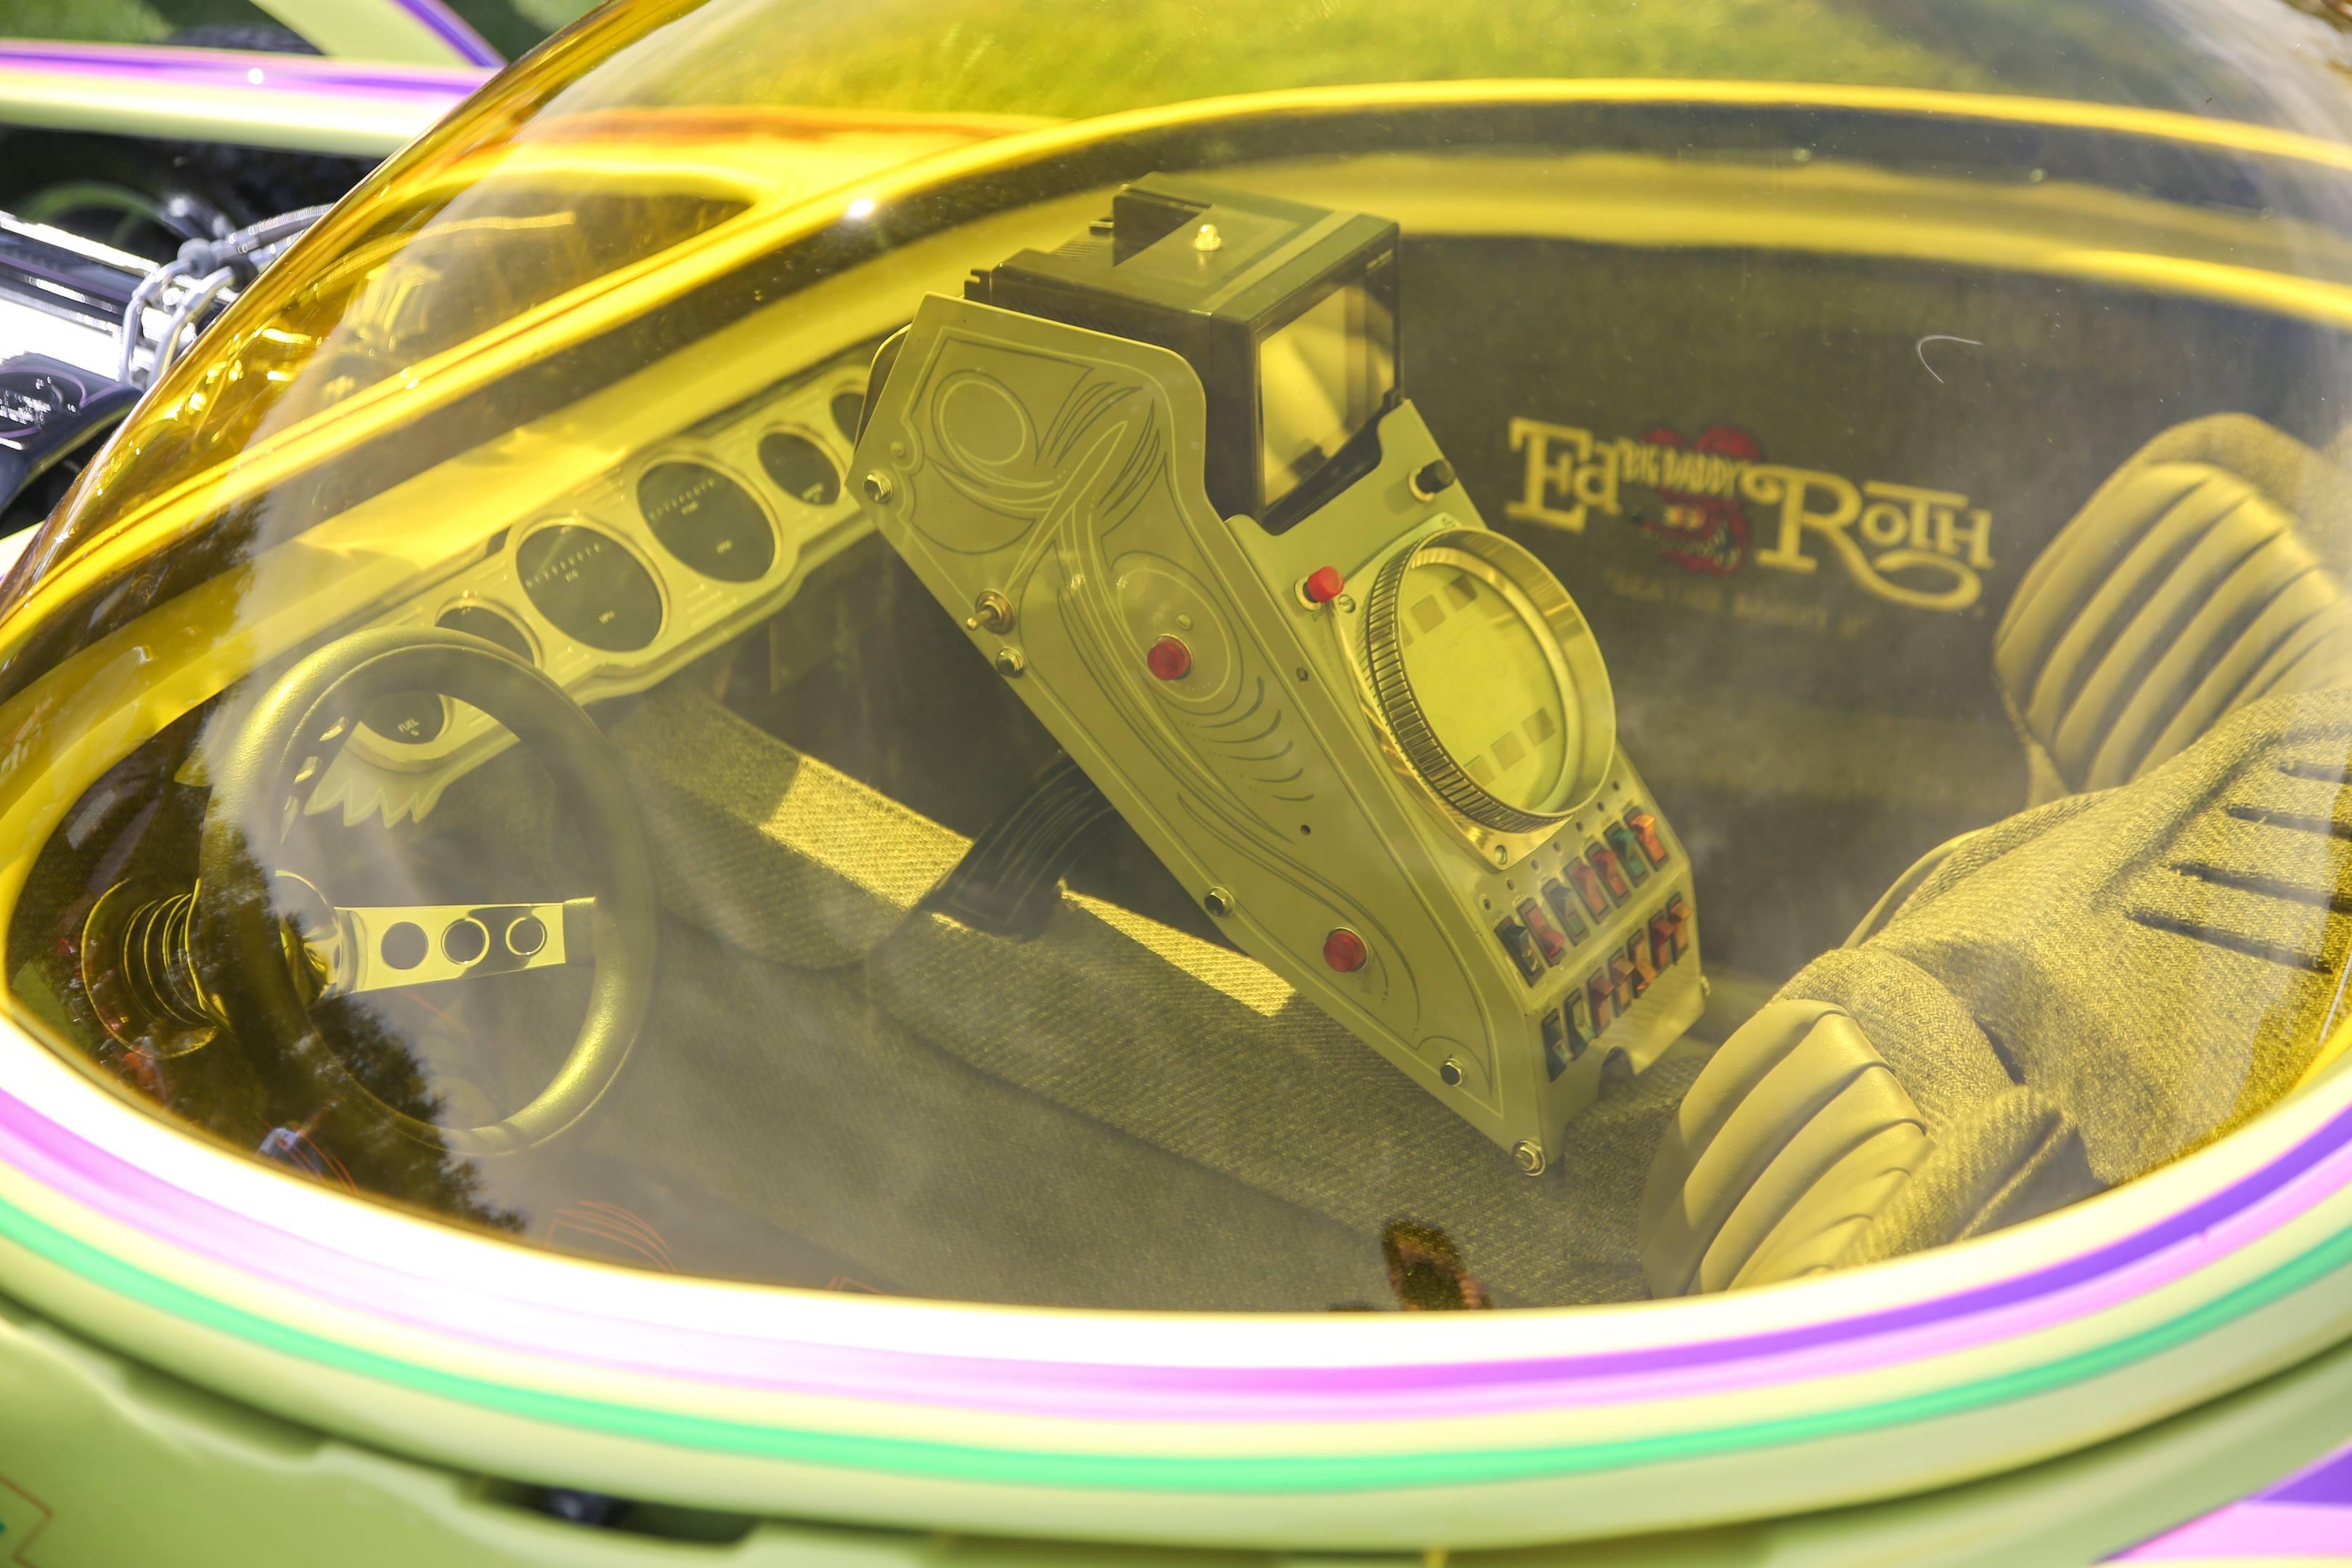 Beatnik Bandit II bubble top